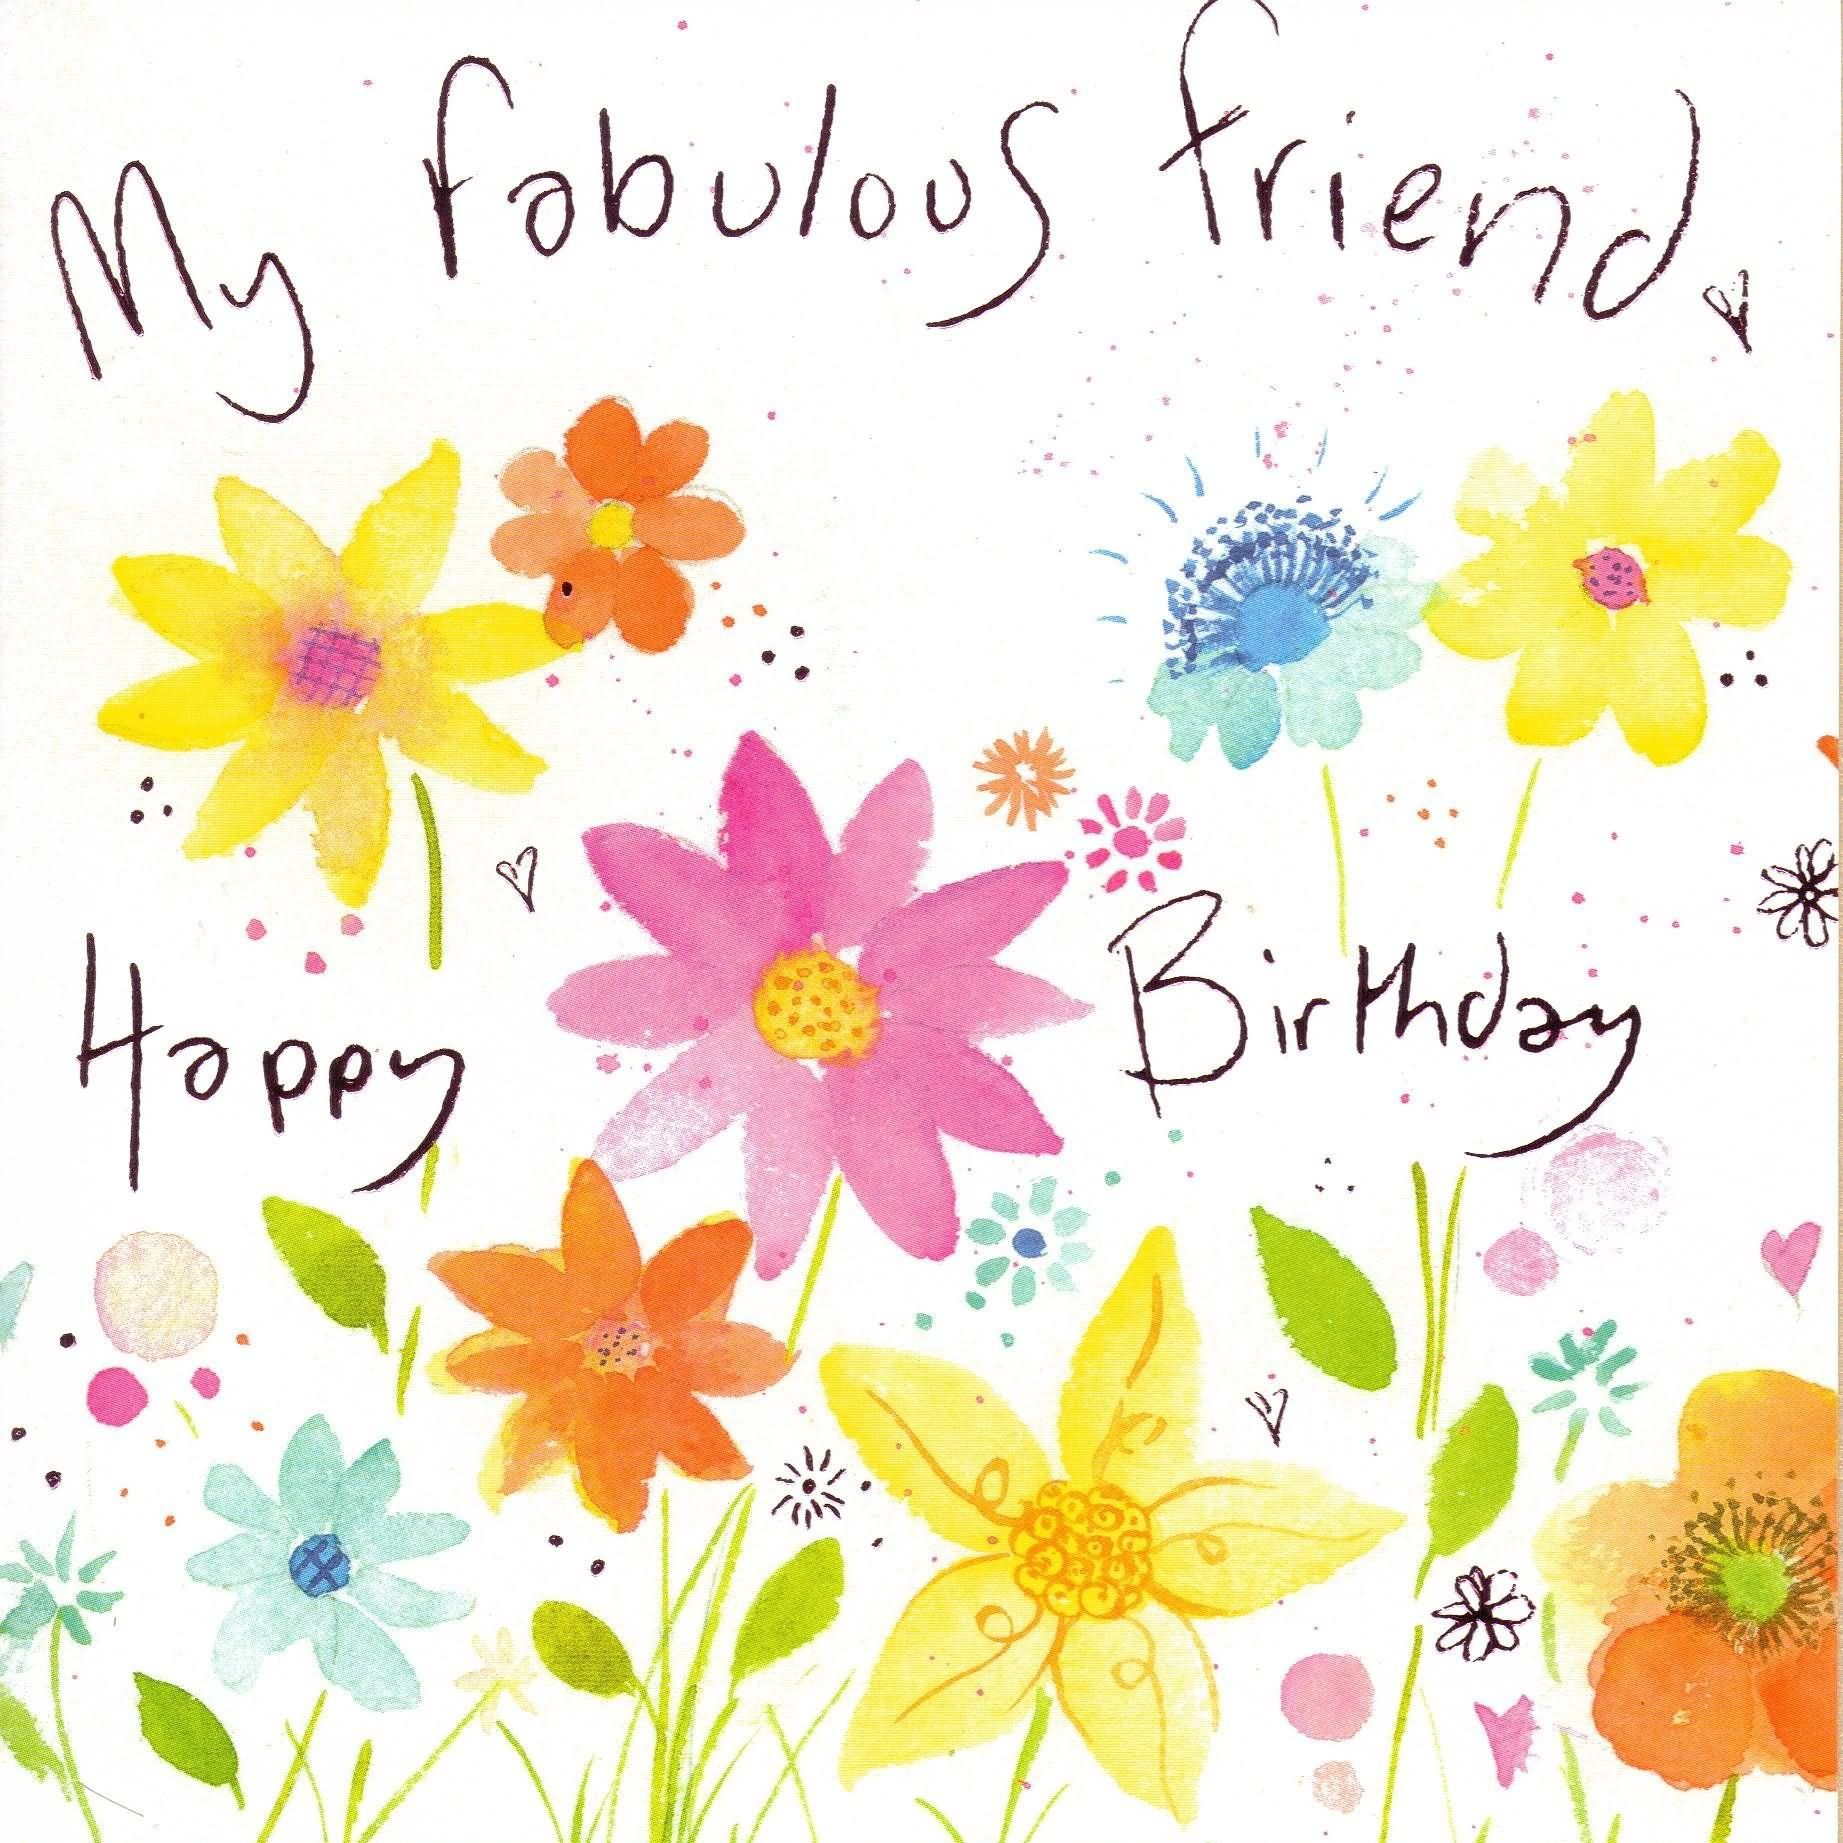 My Fabulous Friend Happy Birthday Graphic 28soimT4.